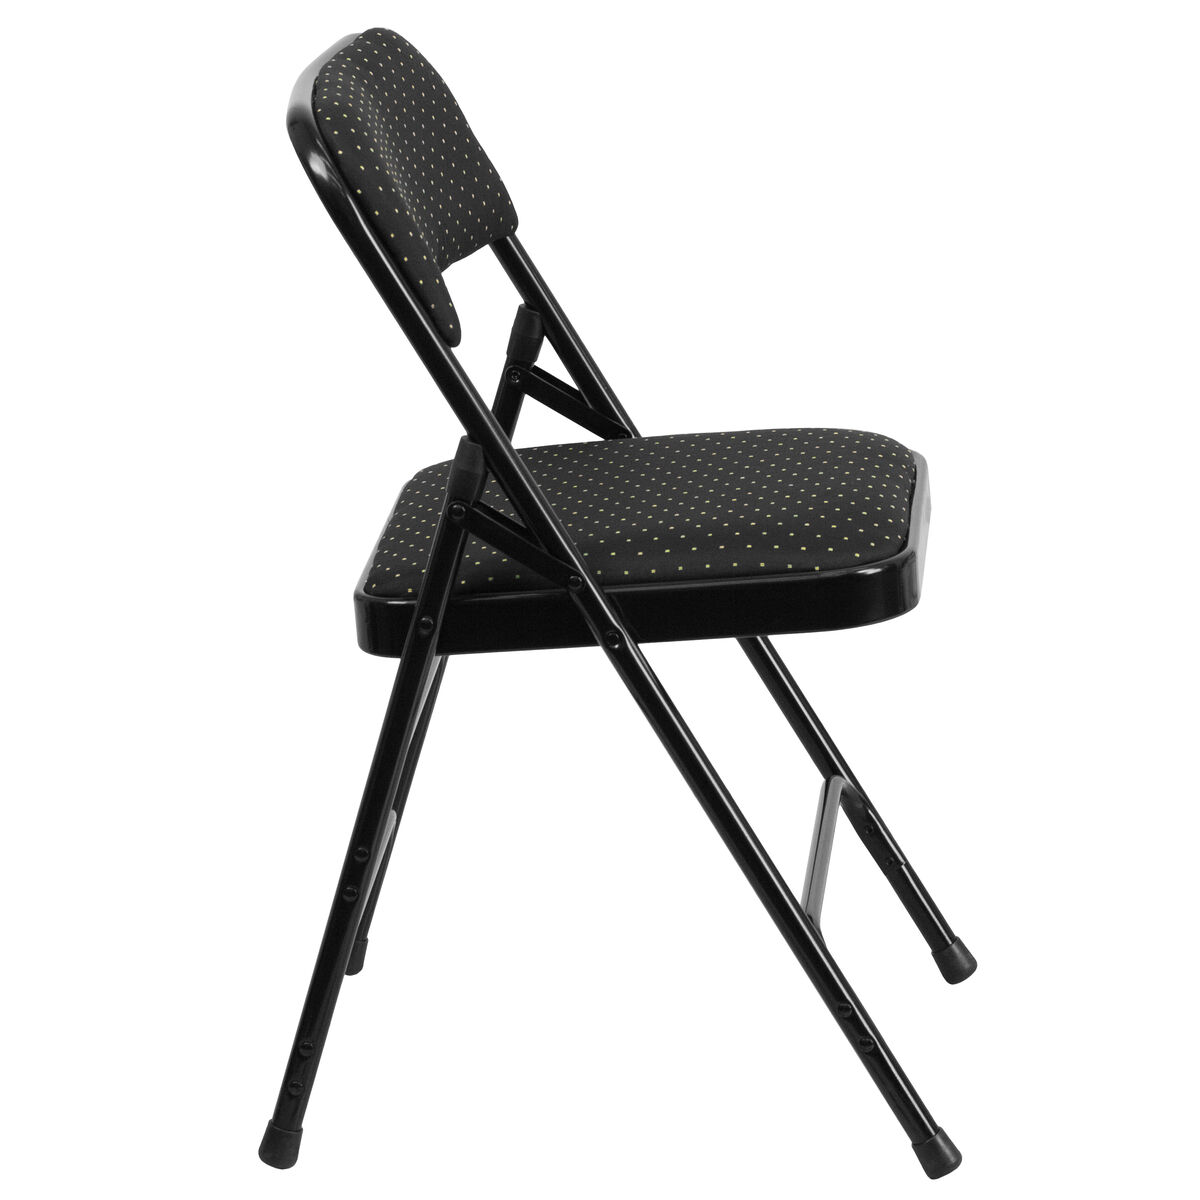 black fabric metal chair aw mc309af blk gg foldingchairs4less com